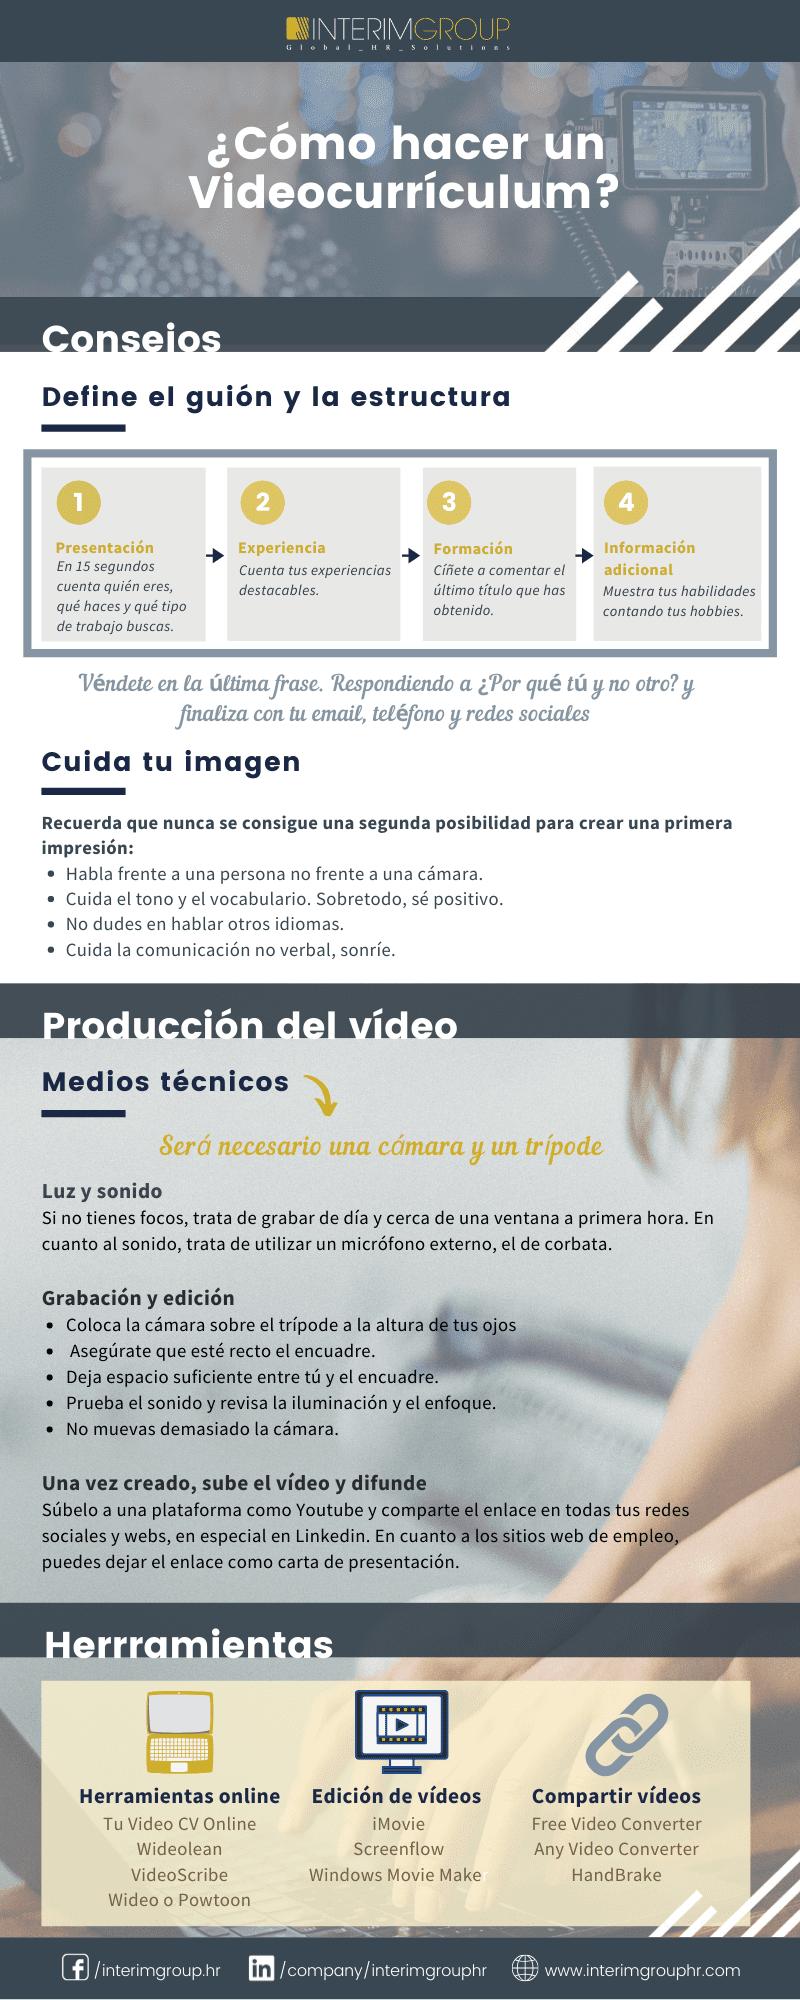 Video-cv_INTERIM-GROUP